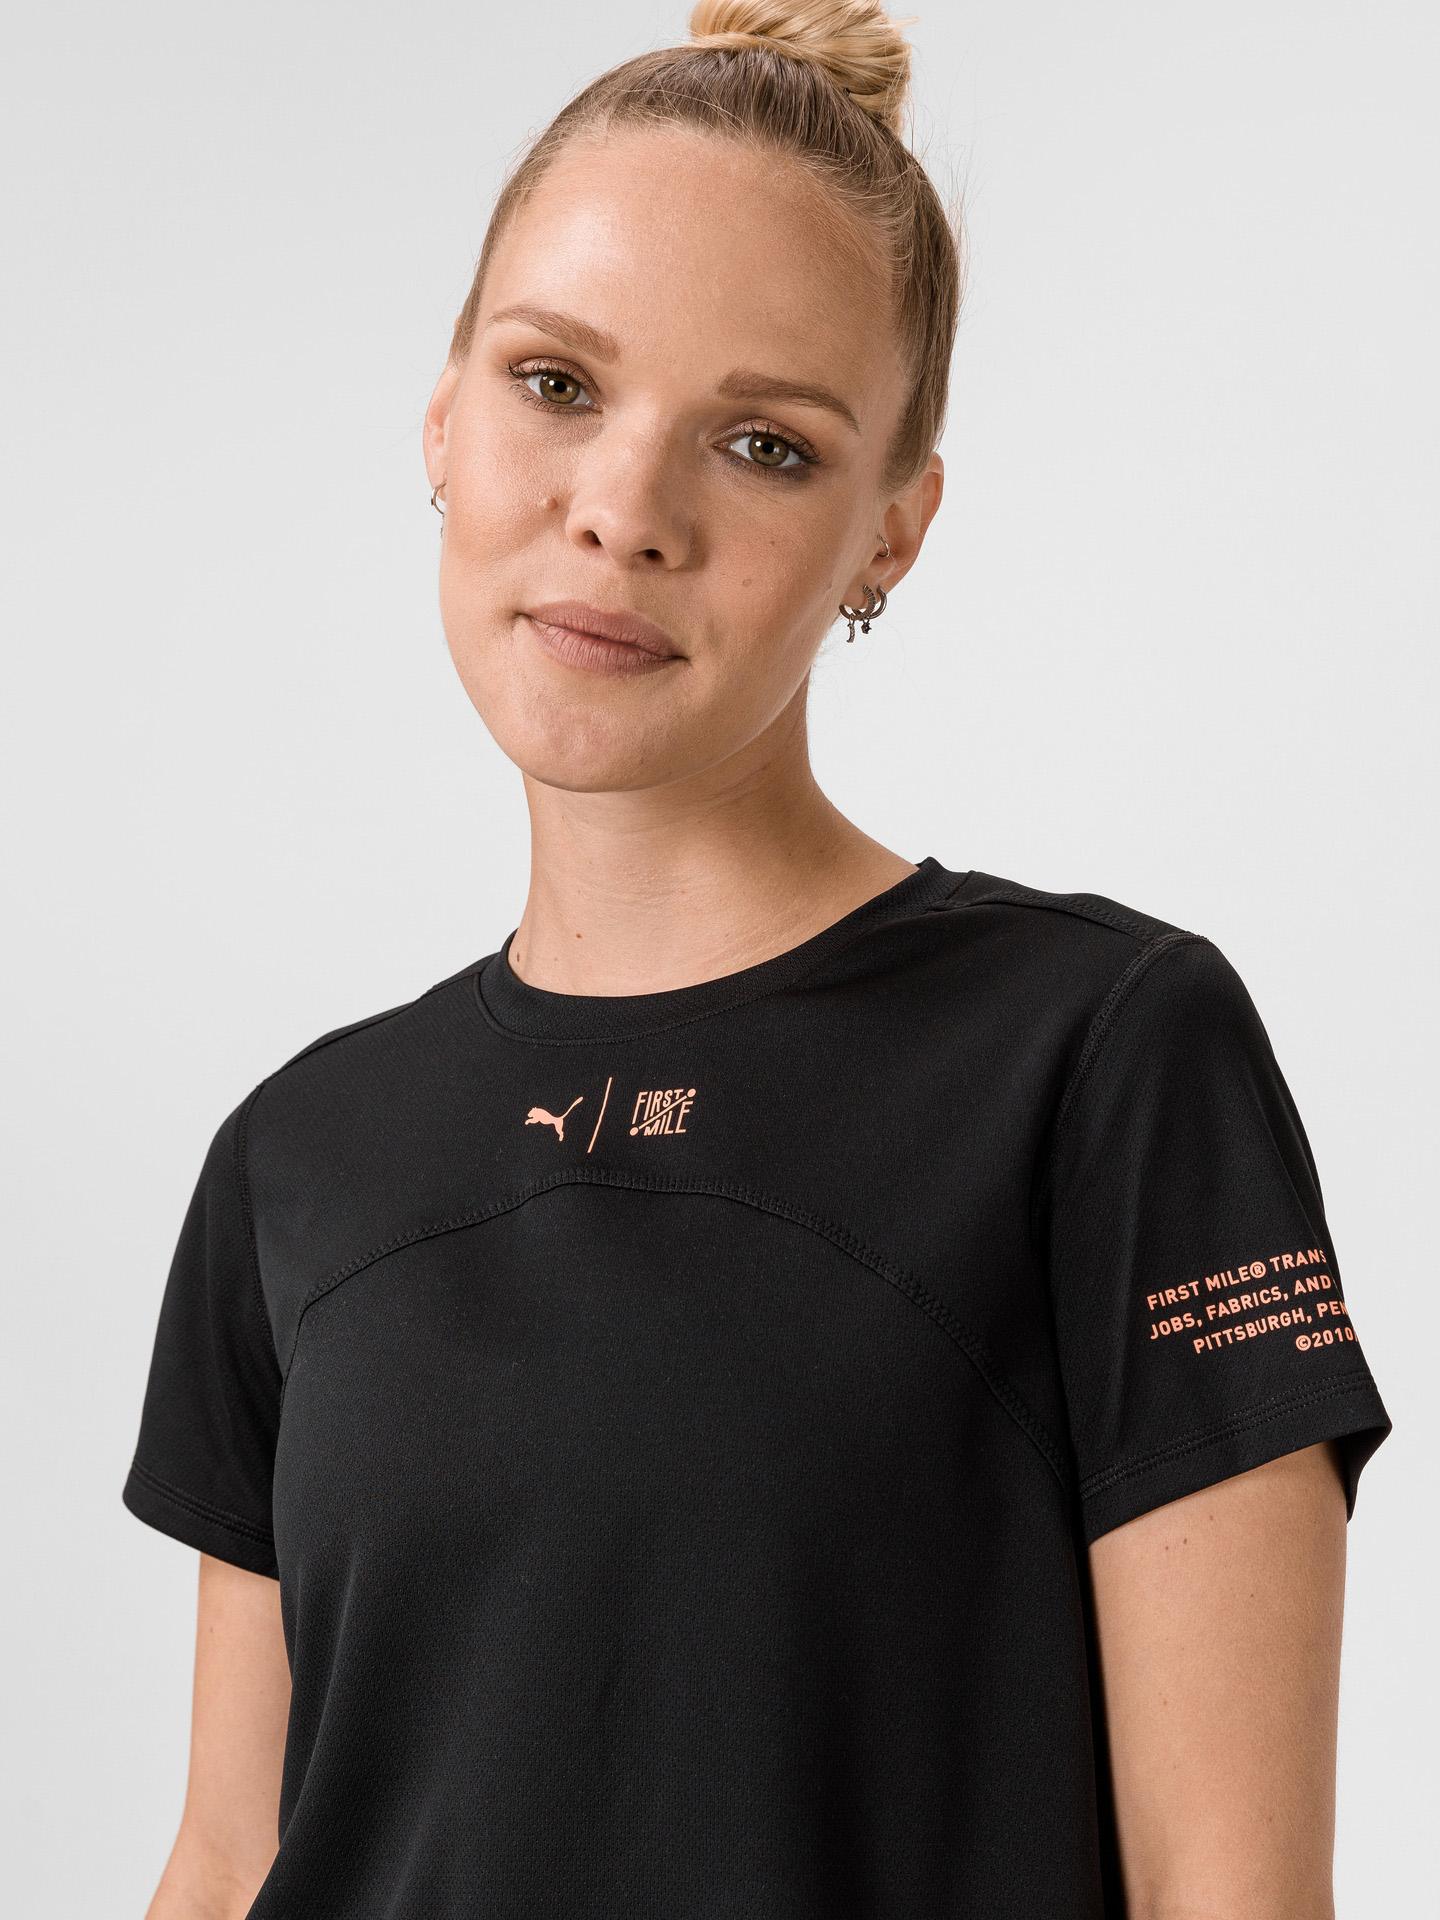 Puma črna ženske majica The First Mile